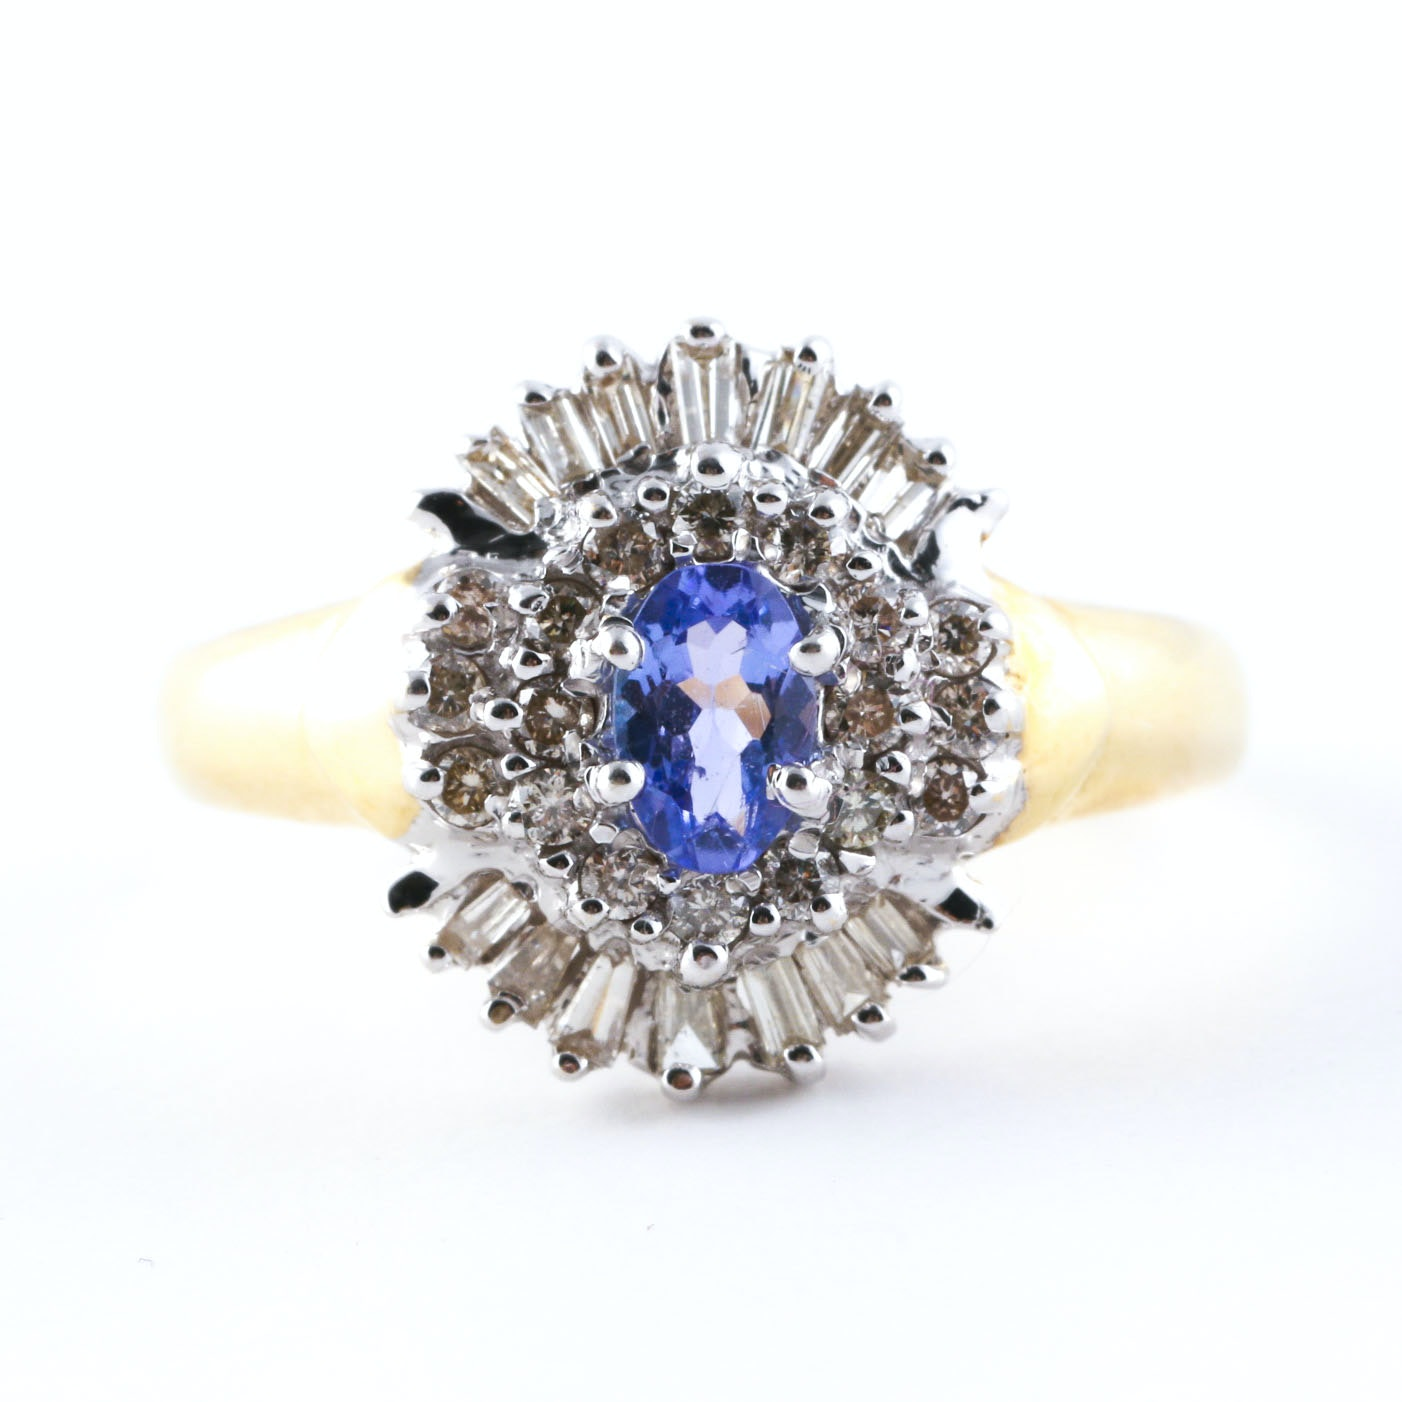 14K Two Tone Gold Tanzanite and Diamond Ring